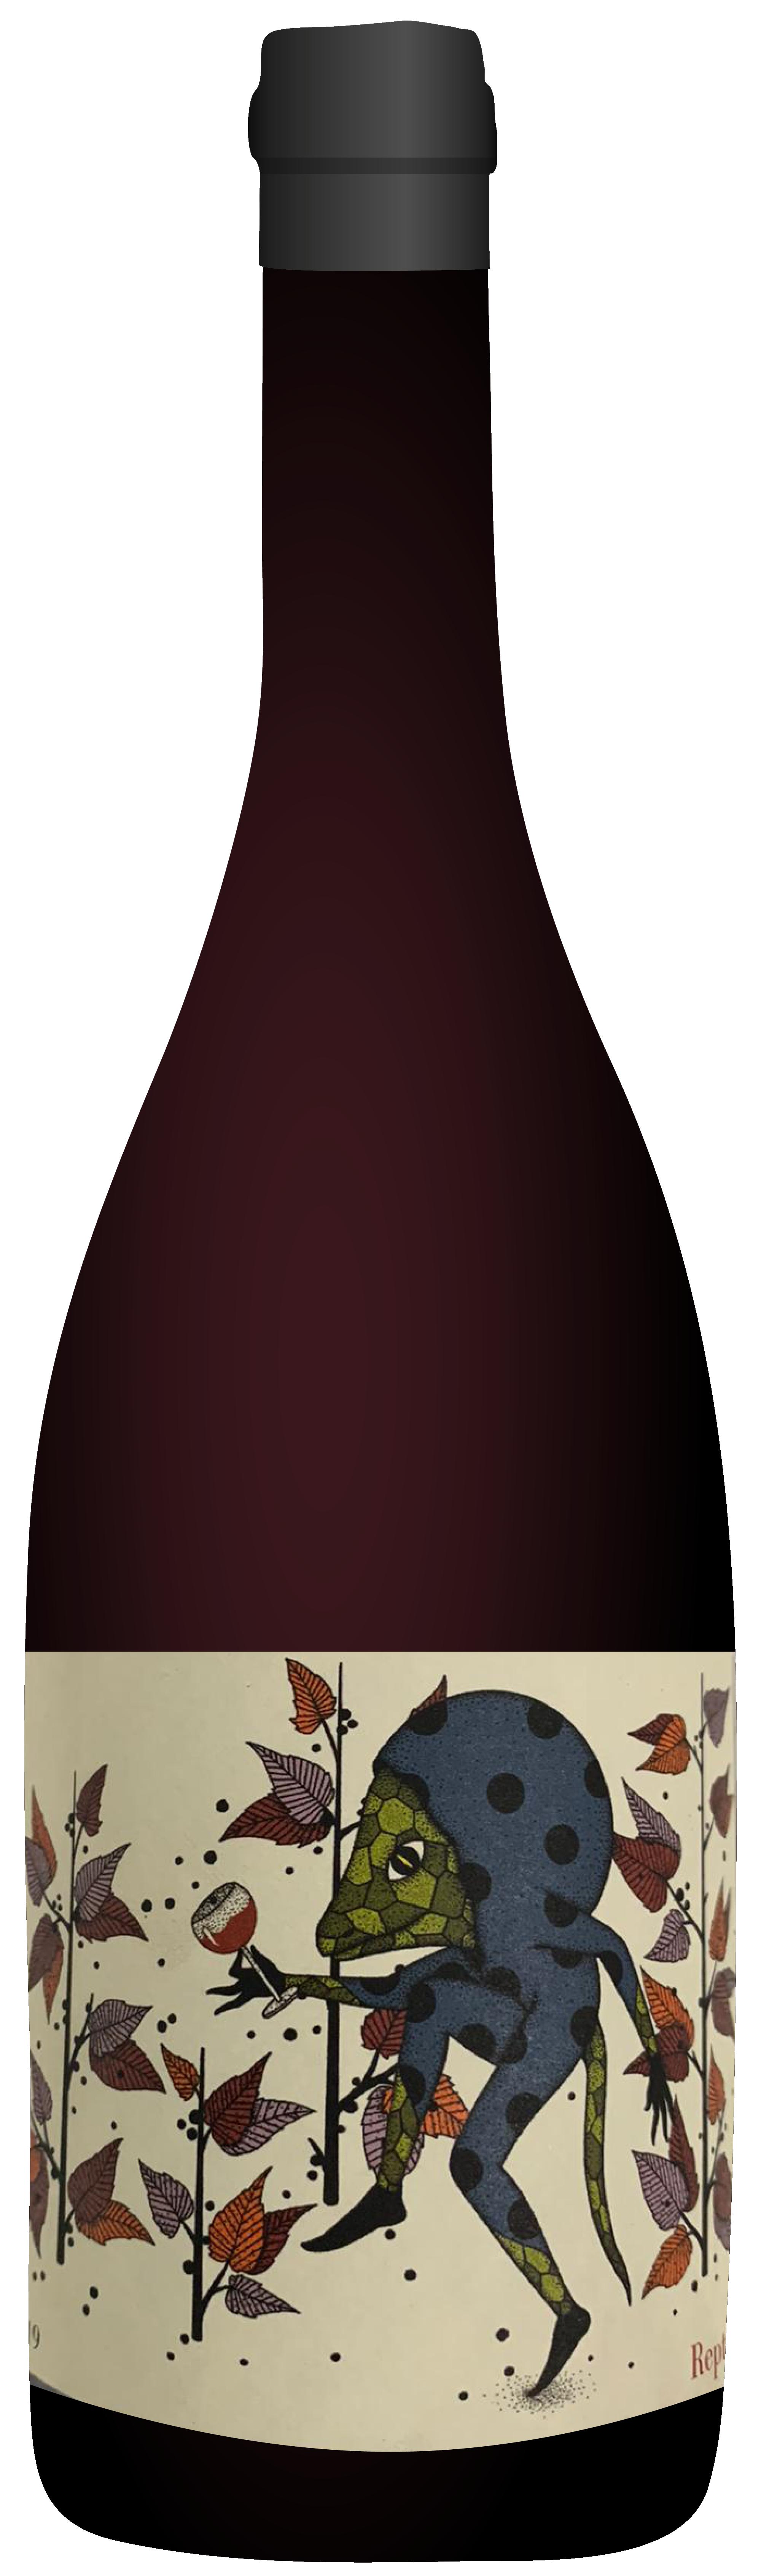 the natural wine company club november 2020 france les salicaires reptilia 2